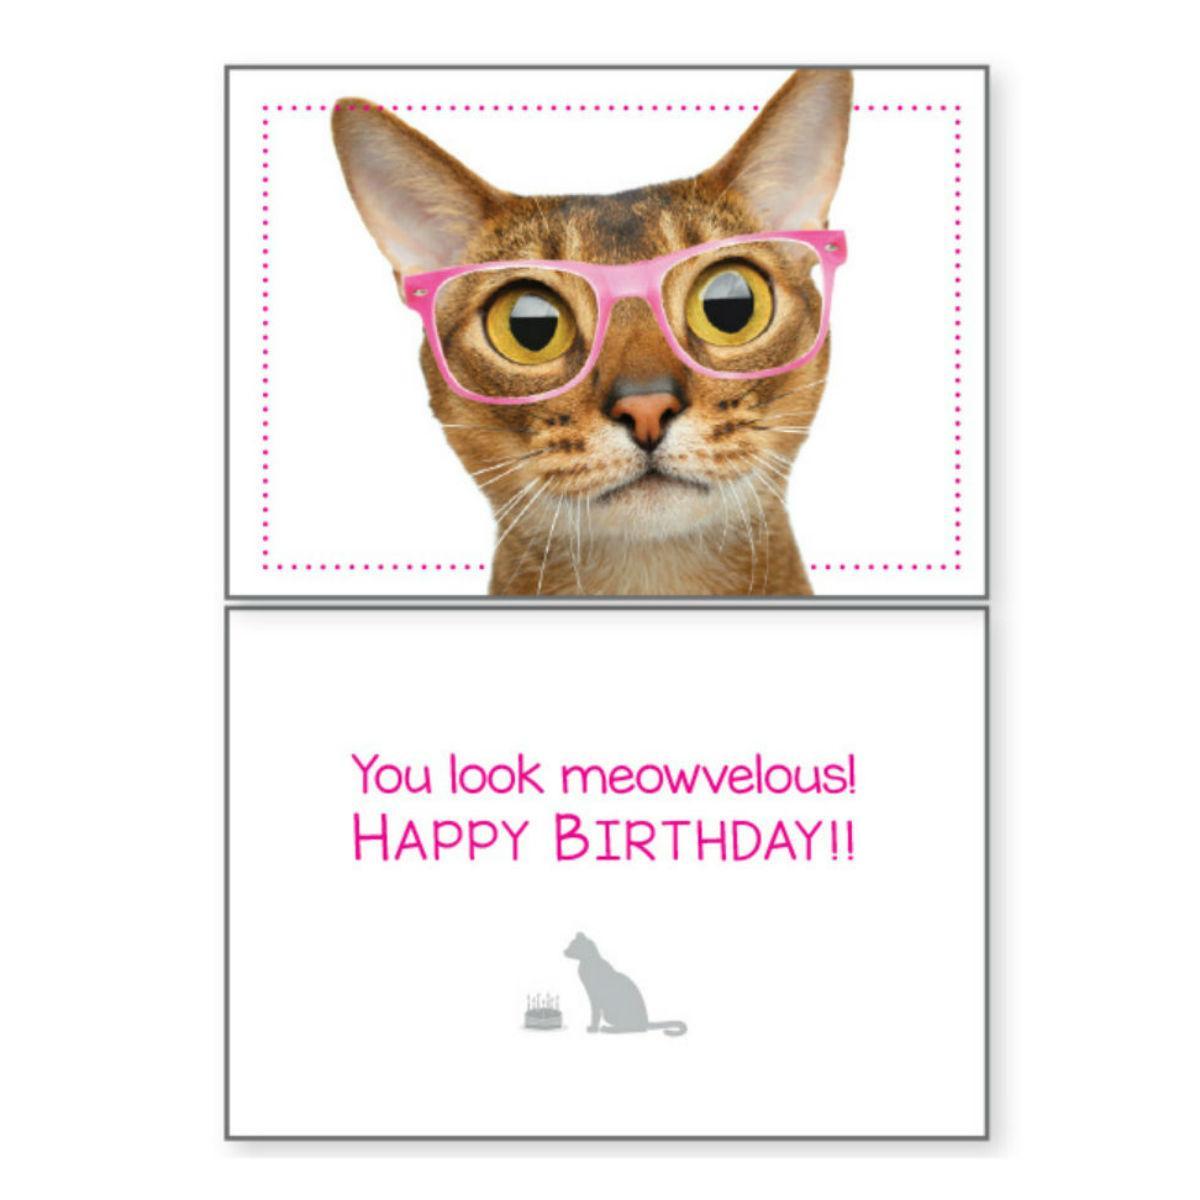 Birthday Greeting Card by Dog Speak - You Look Meowvelous